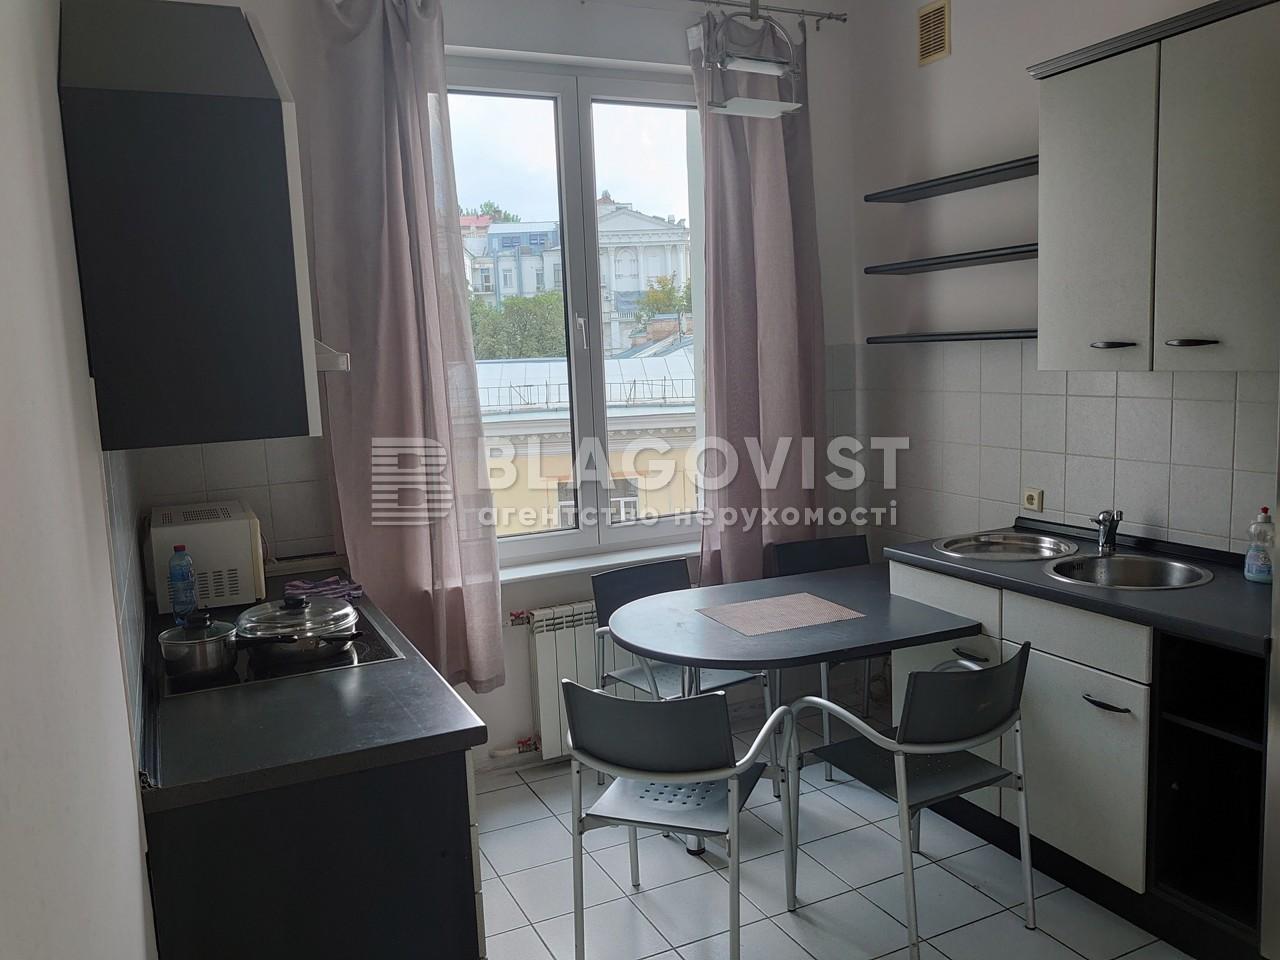 Квартира R-39925, Крещатик, 21, Киев - Фото 12